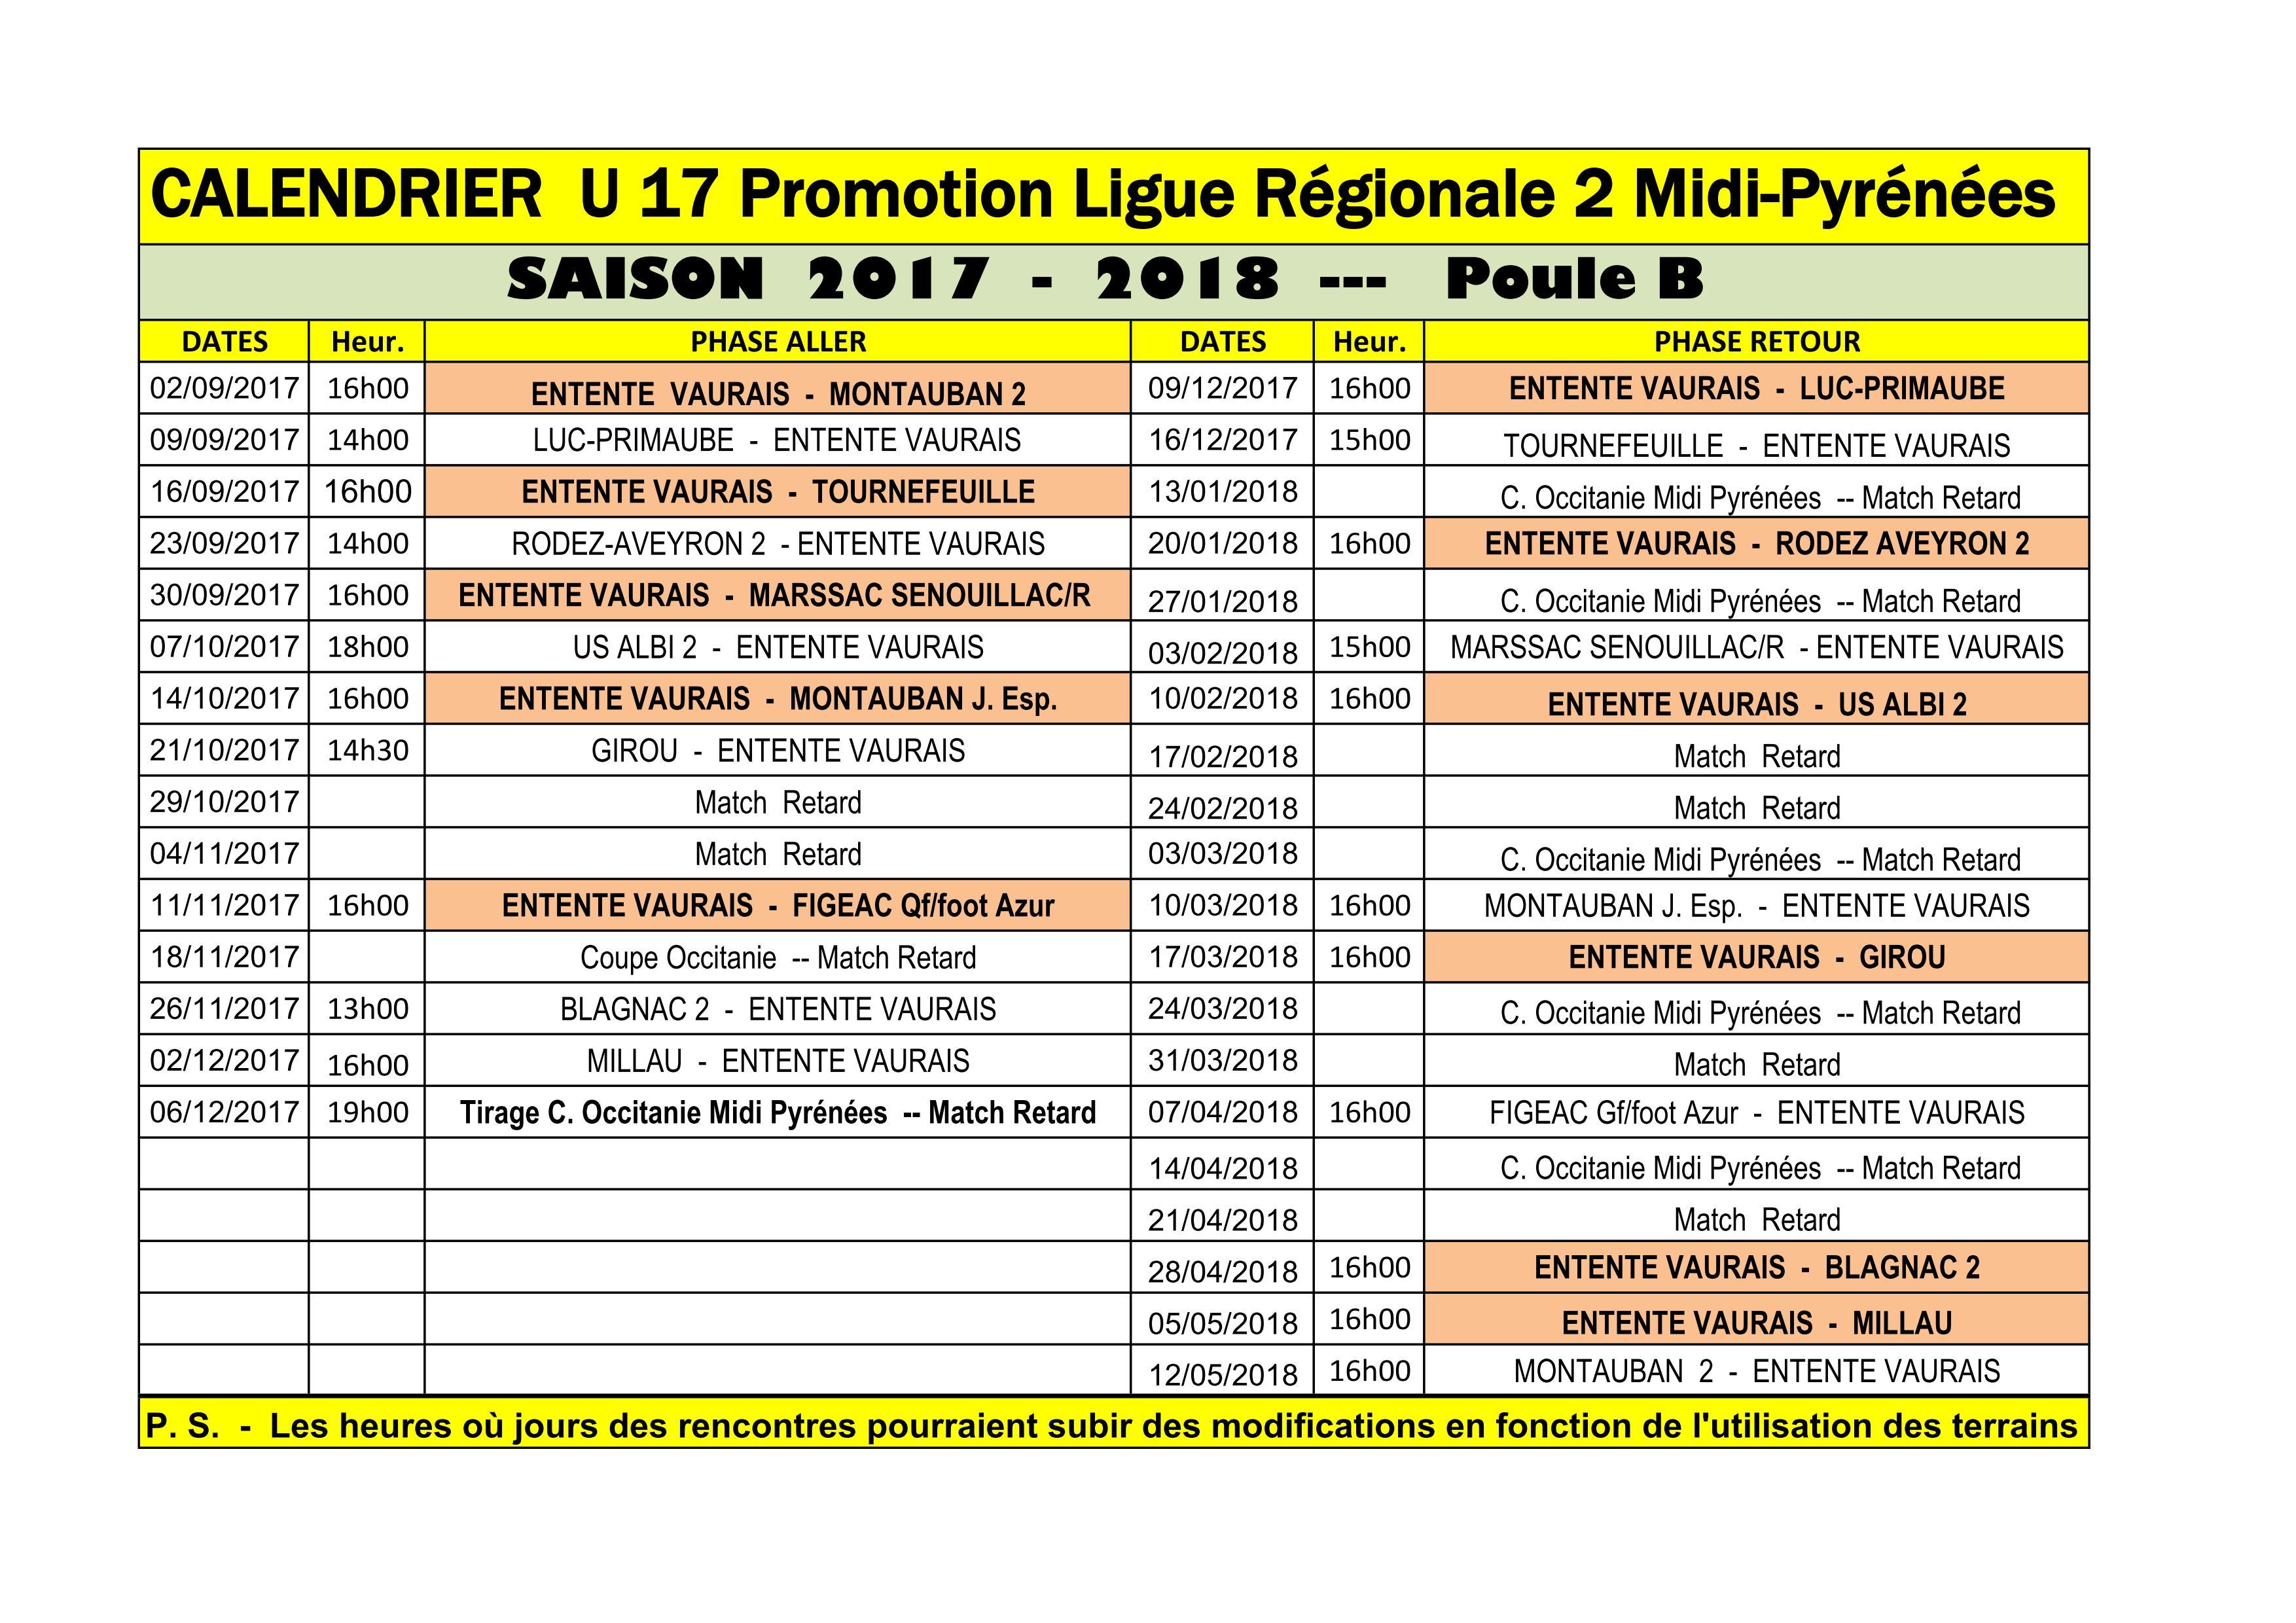 Calendrier des rencontres afrobasket 2018